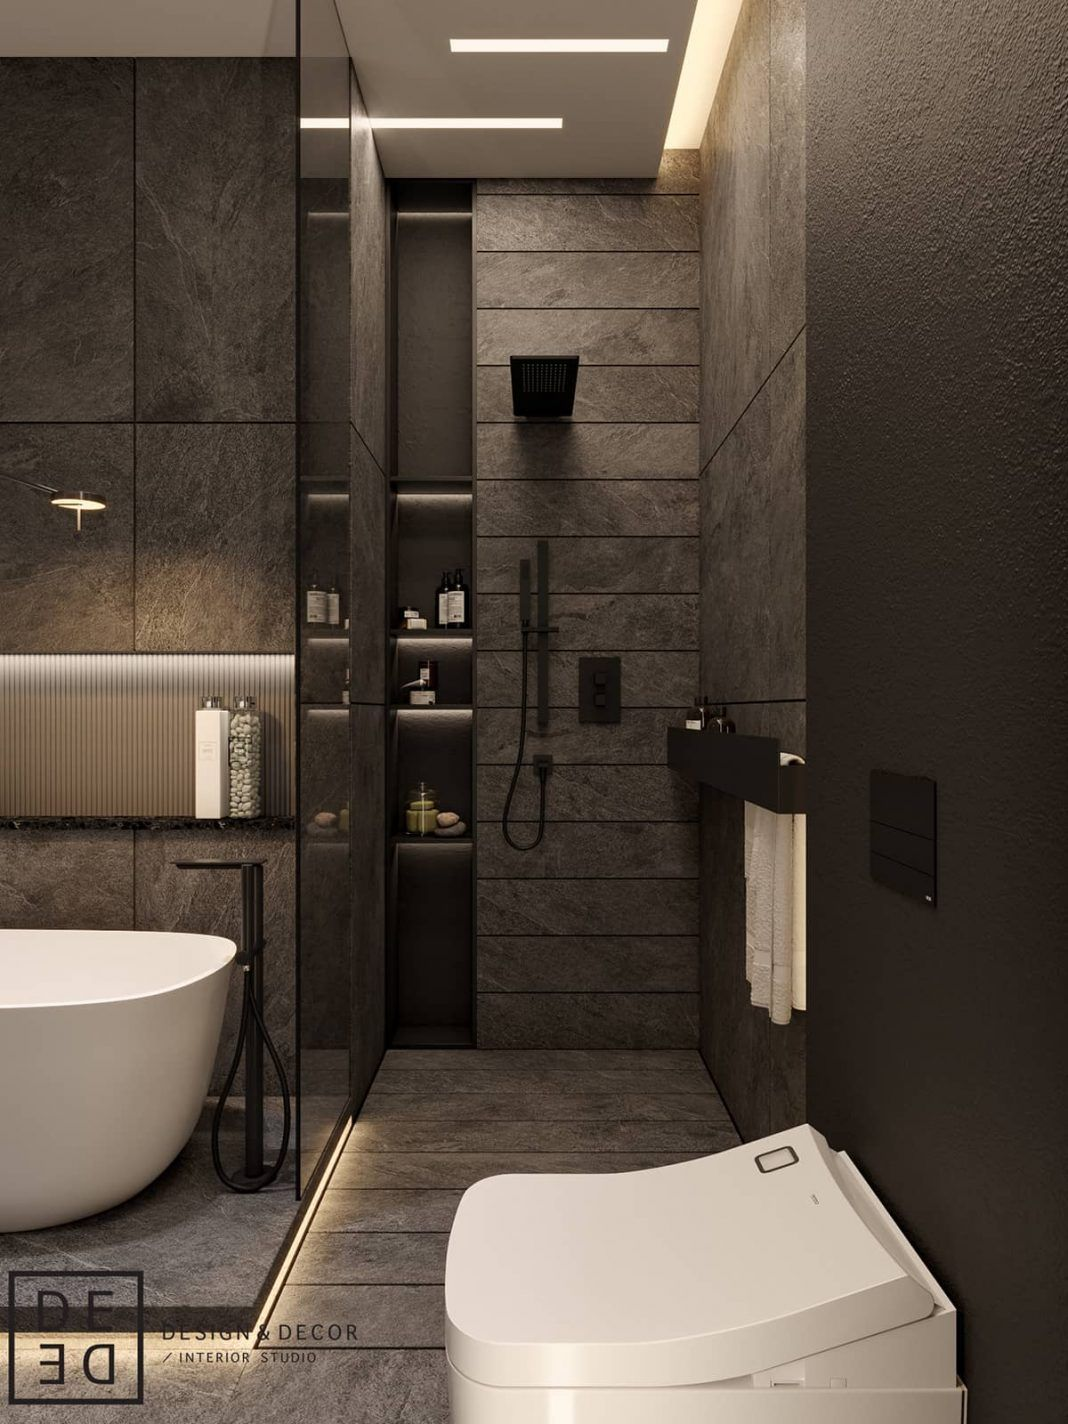 De De Apartment Gorgeous Minimalism With Wooden Accents Dezign Ark Beta Bathroom Interior Design Washroom Design Bathroom Design